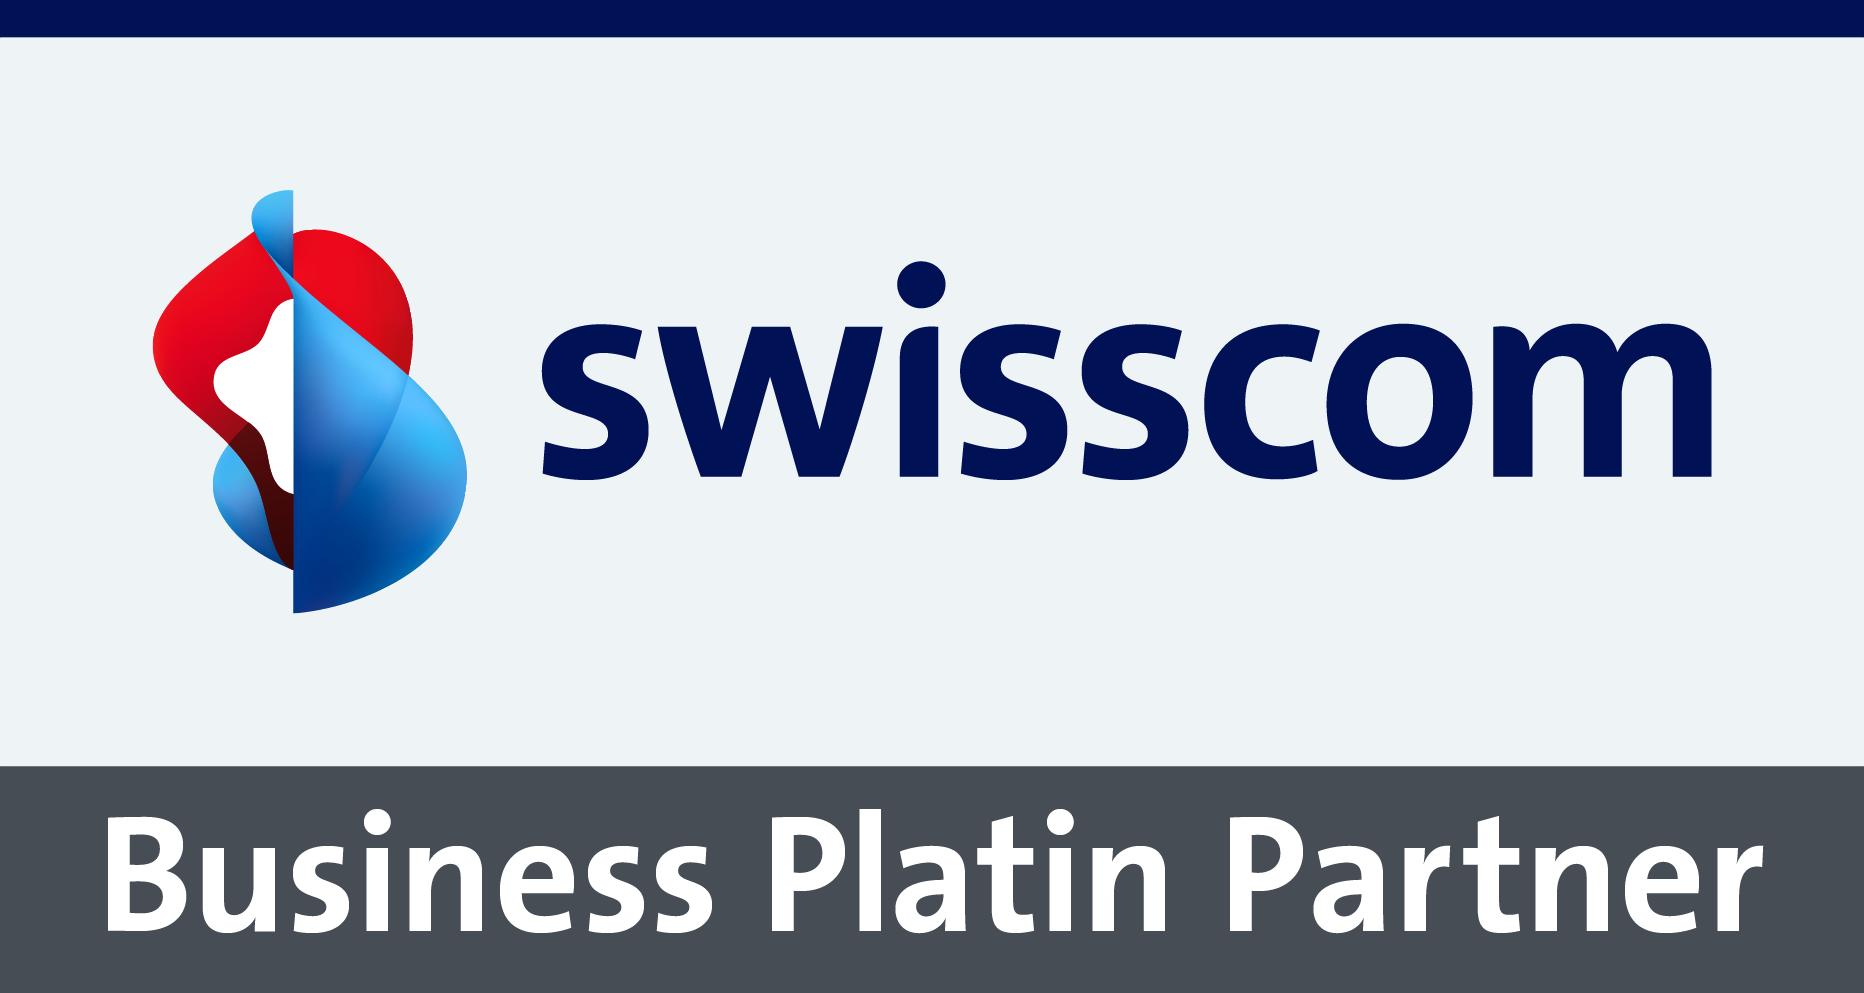 swisscom_business-partner-platinrgb